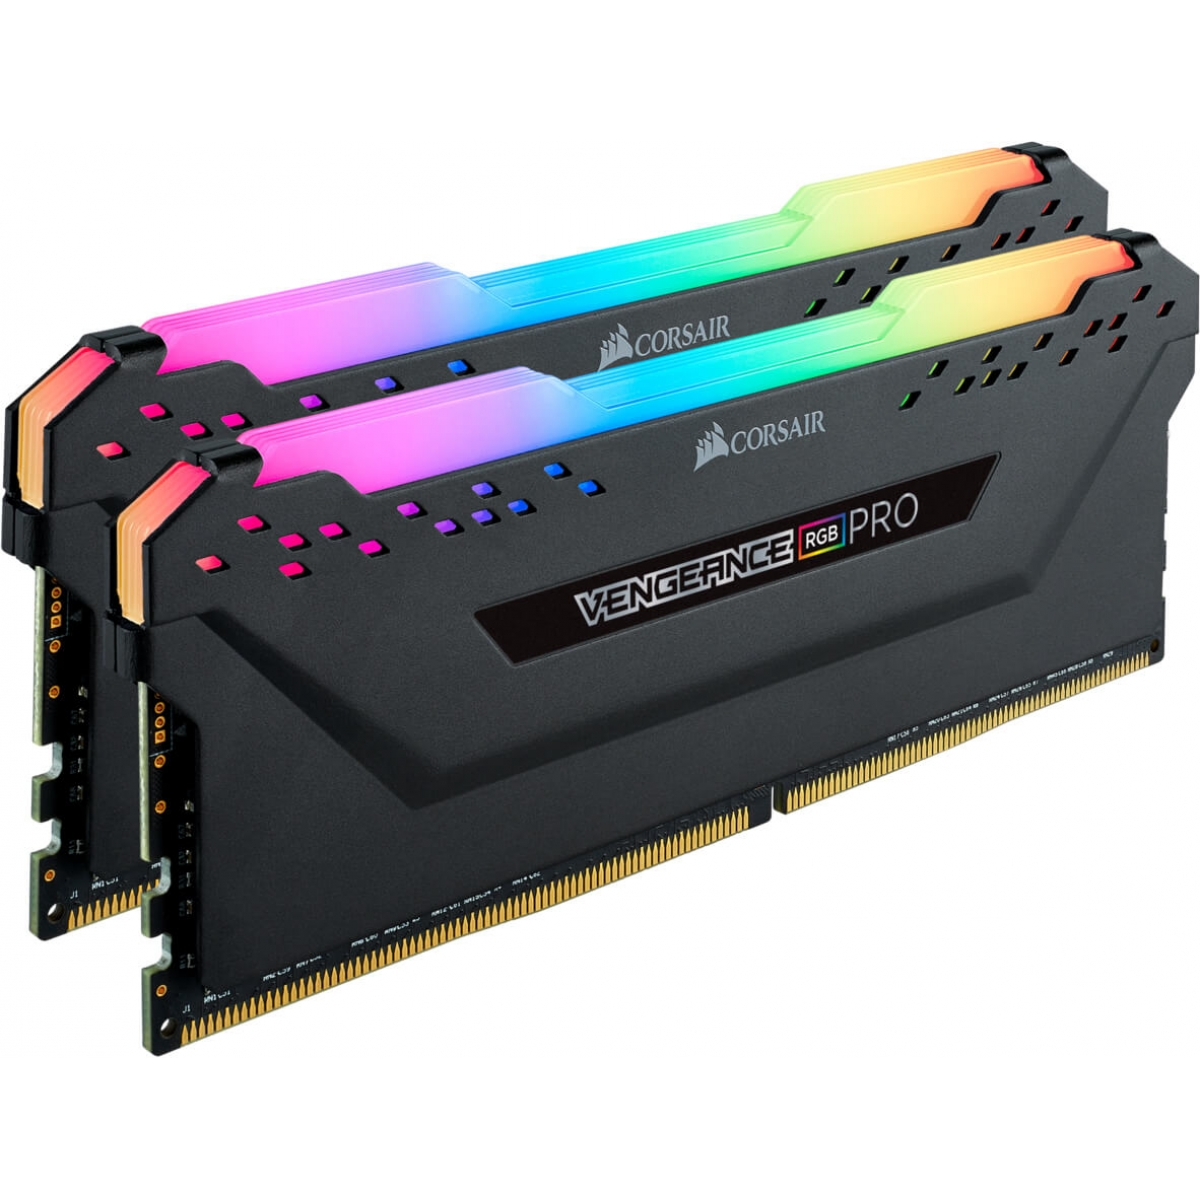 Memória DDR4 Corsair Vengeance RGB Pro, 16GB (2x8GB) 3600MHz, CMW16GX4M2C3600C18